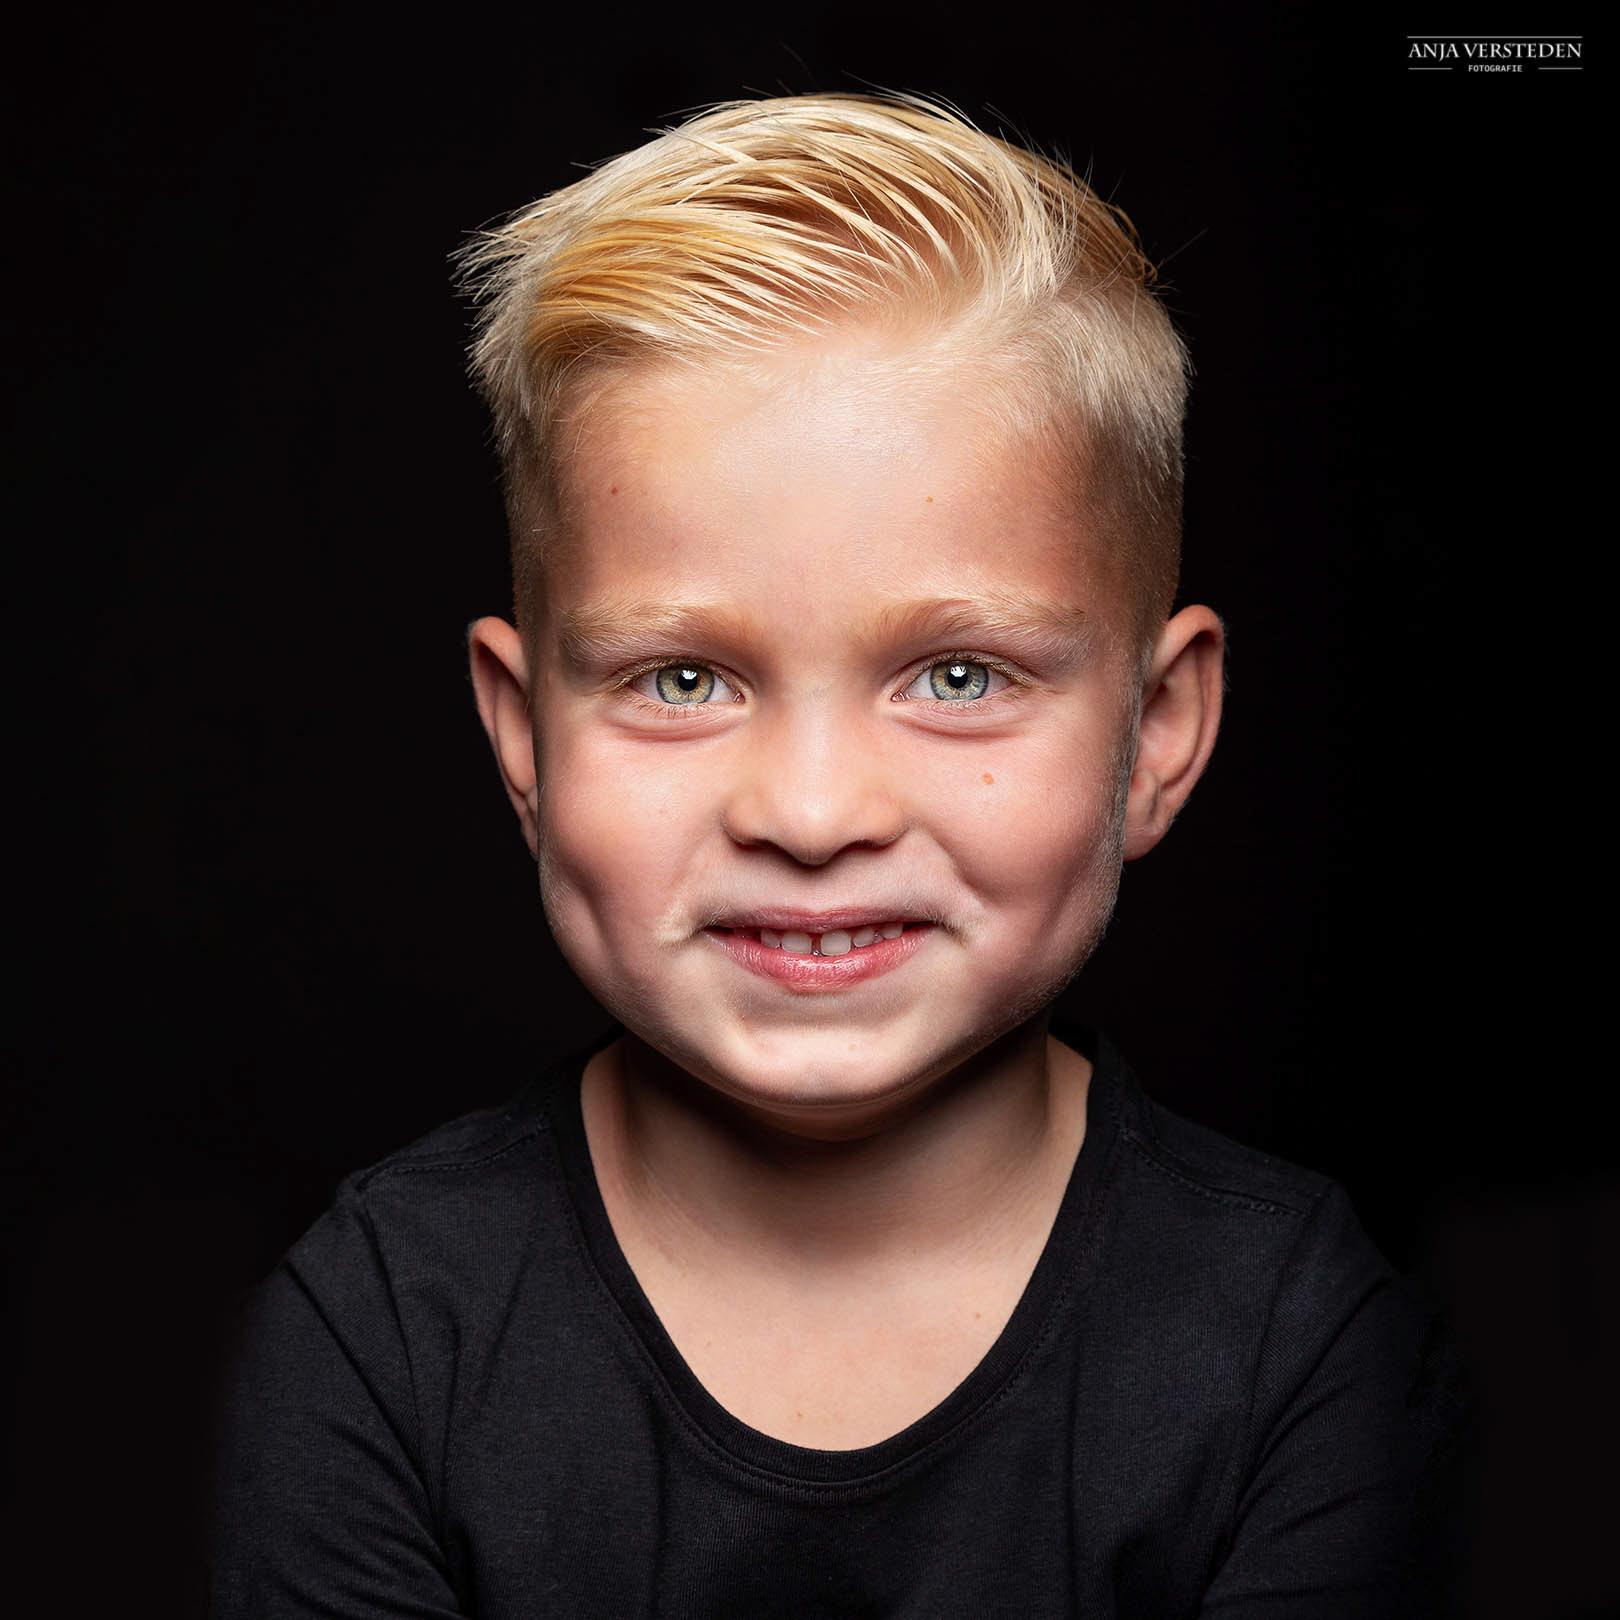 Kinderportret | Anja Versteden Fotografie